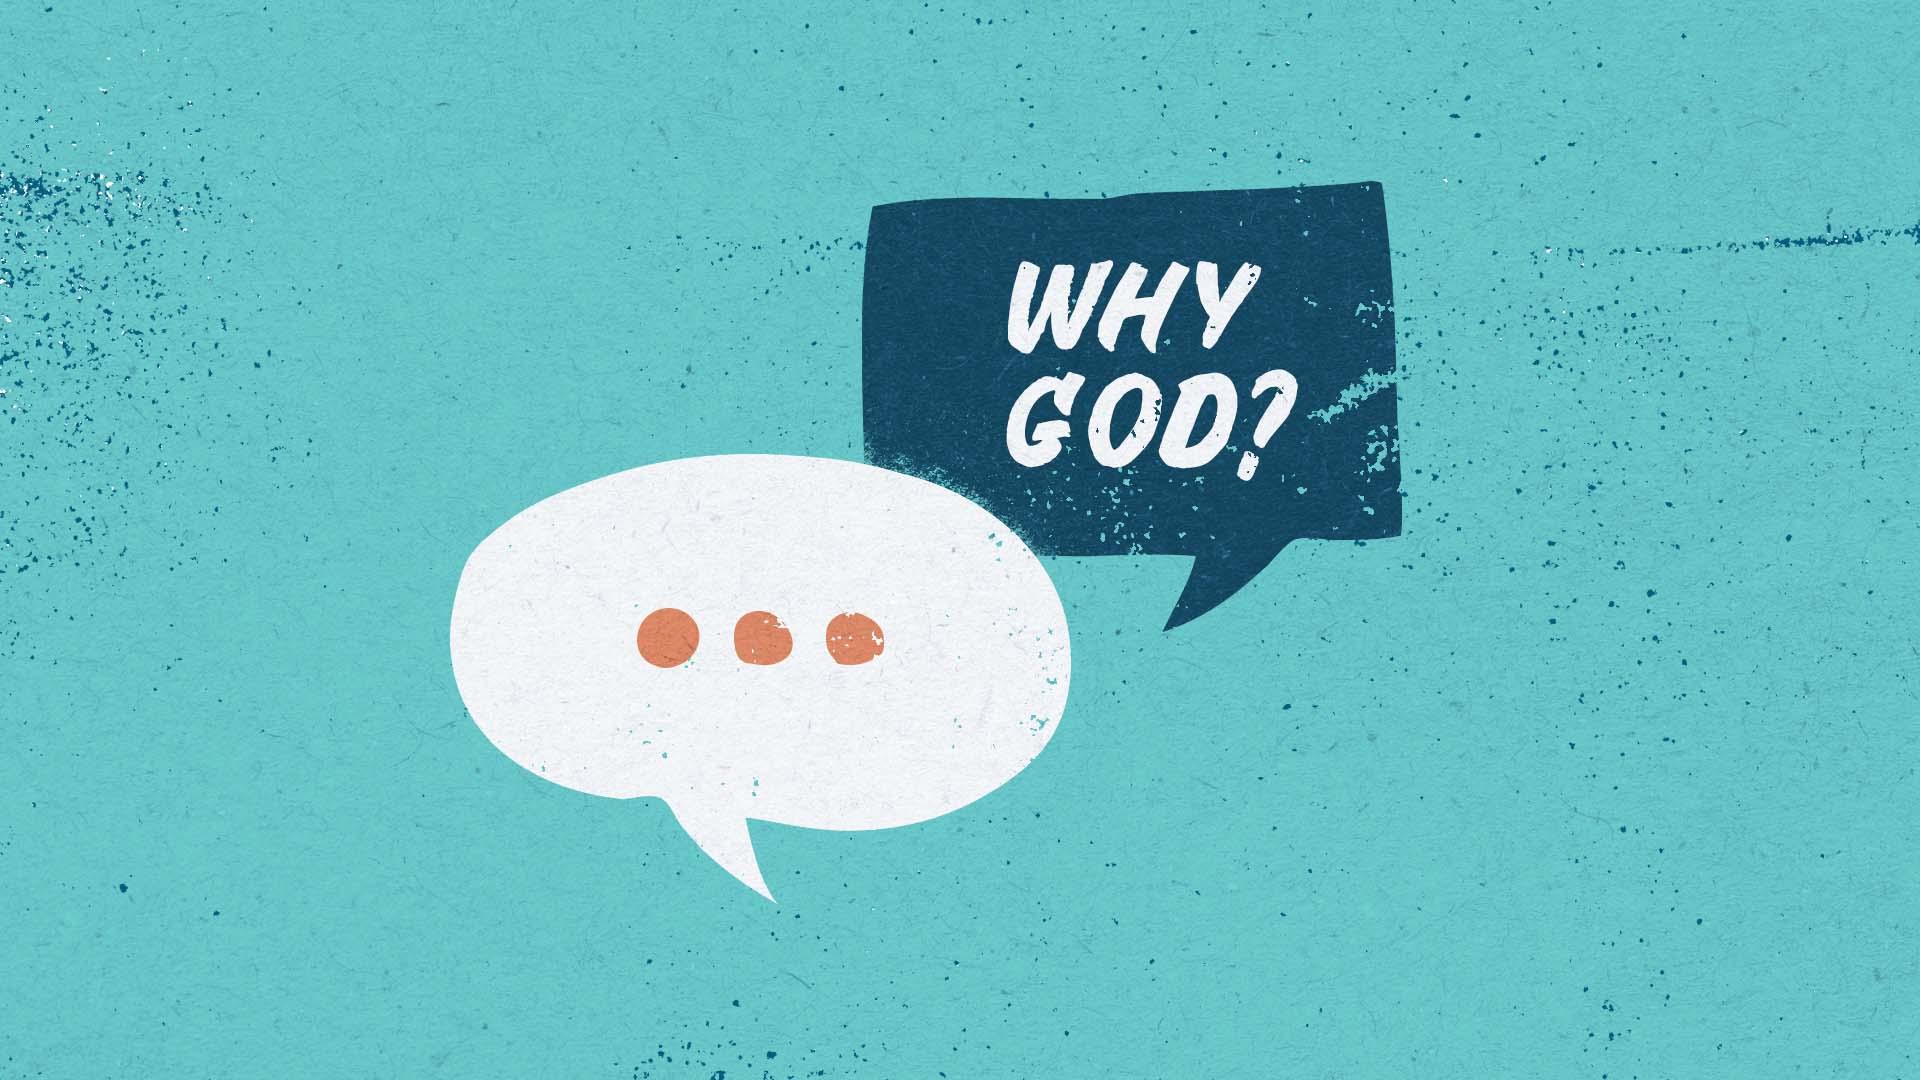 Why God?